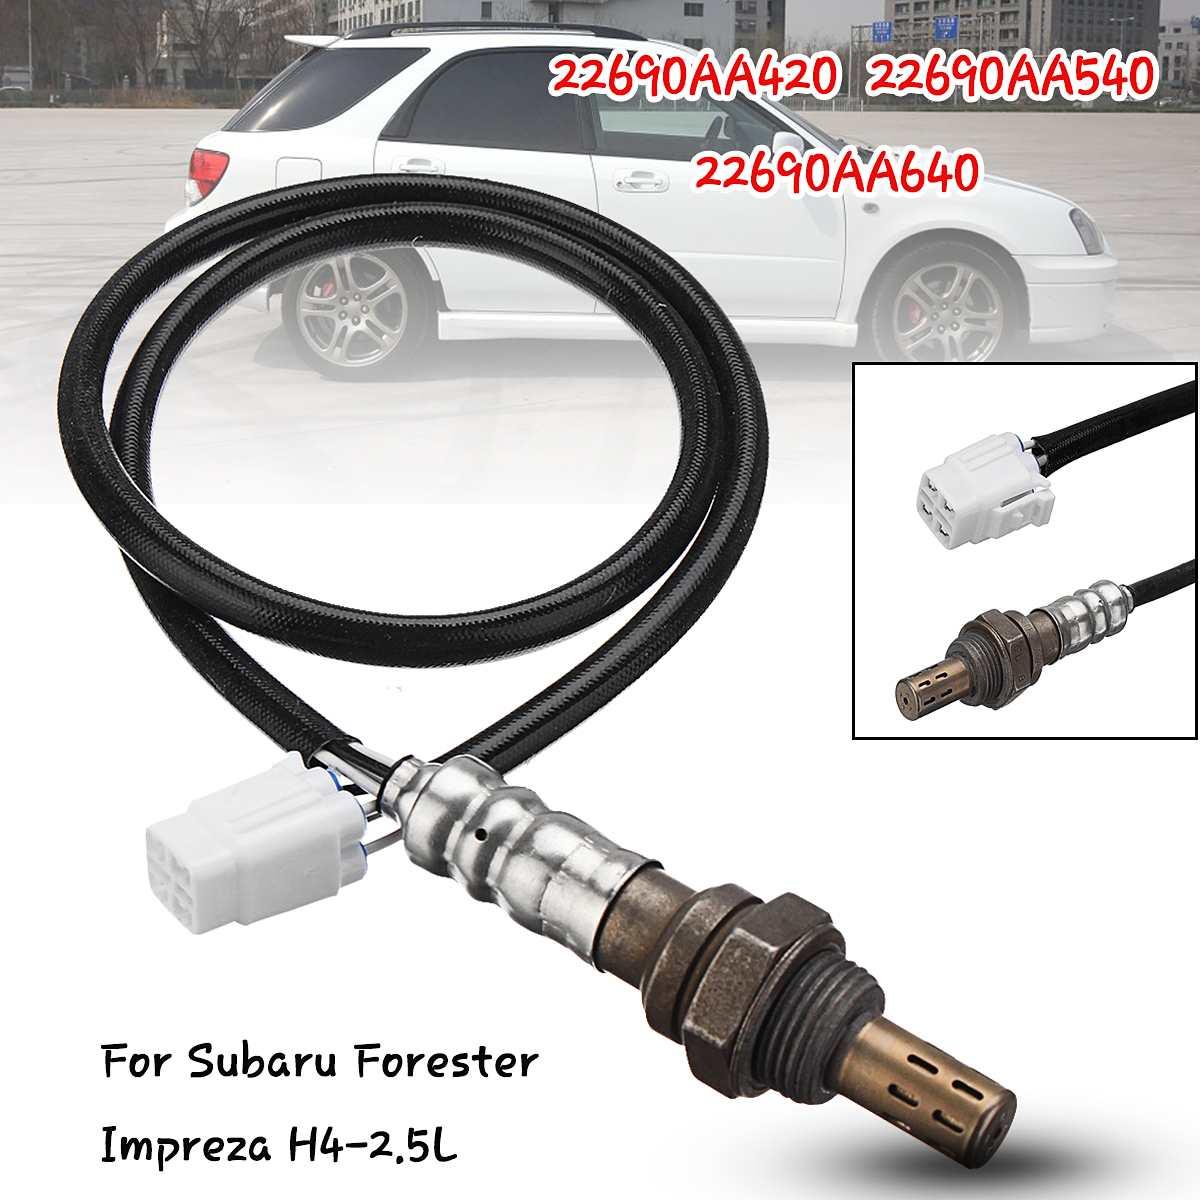 New Downstream Oxygen O2 Sensor 22690AA420 For Subaru Forester Impreza H4-2.5LNew Downstream Oxygen O2 Sensor 22690AA420 For Subaru Forester Impreza H4-2.5L